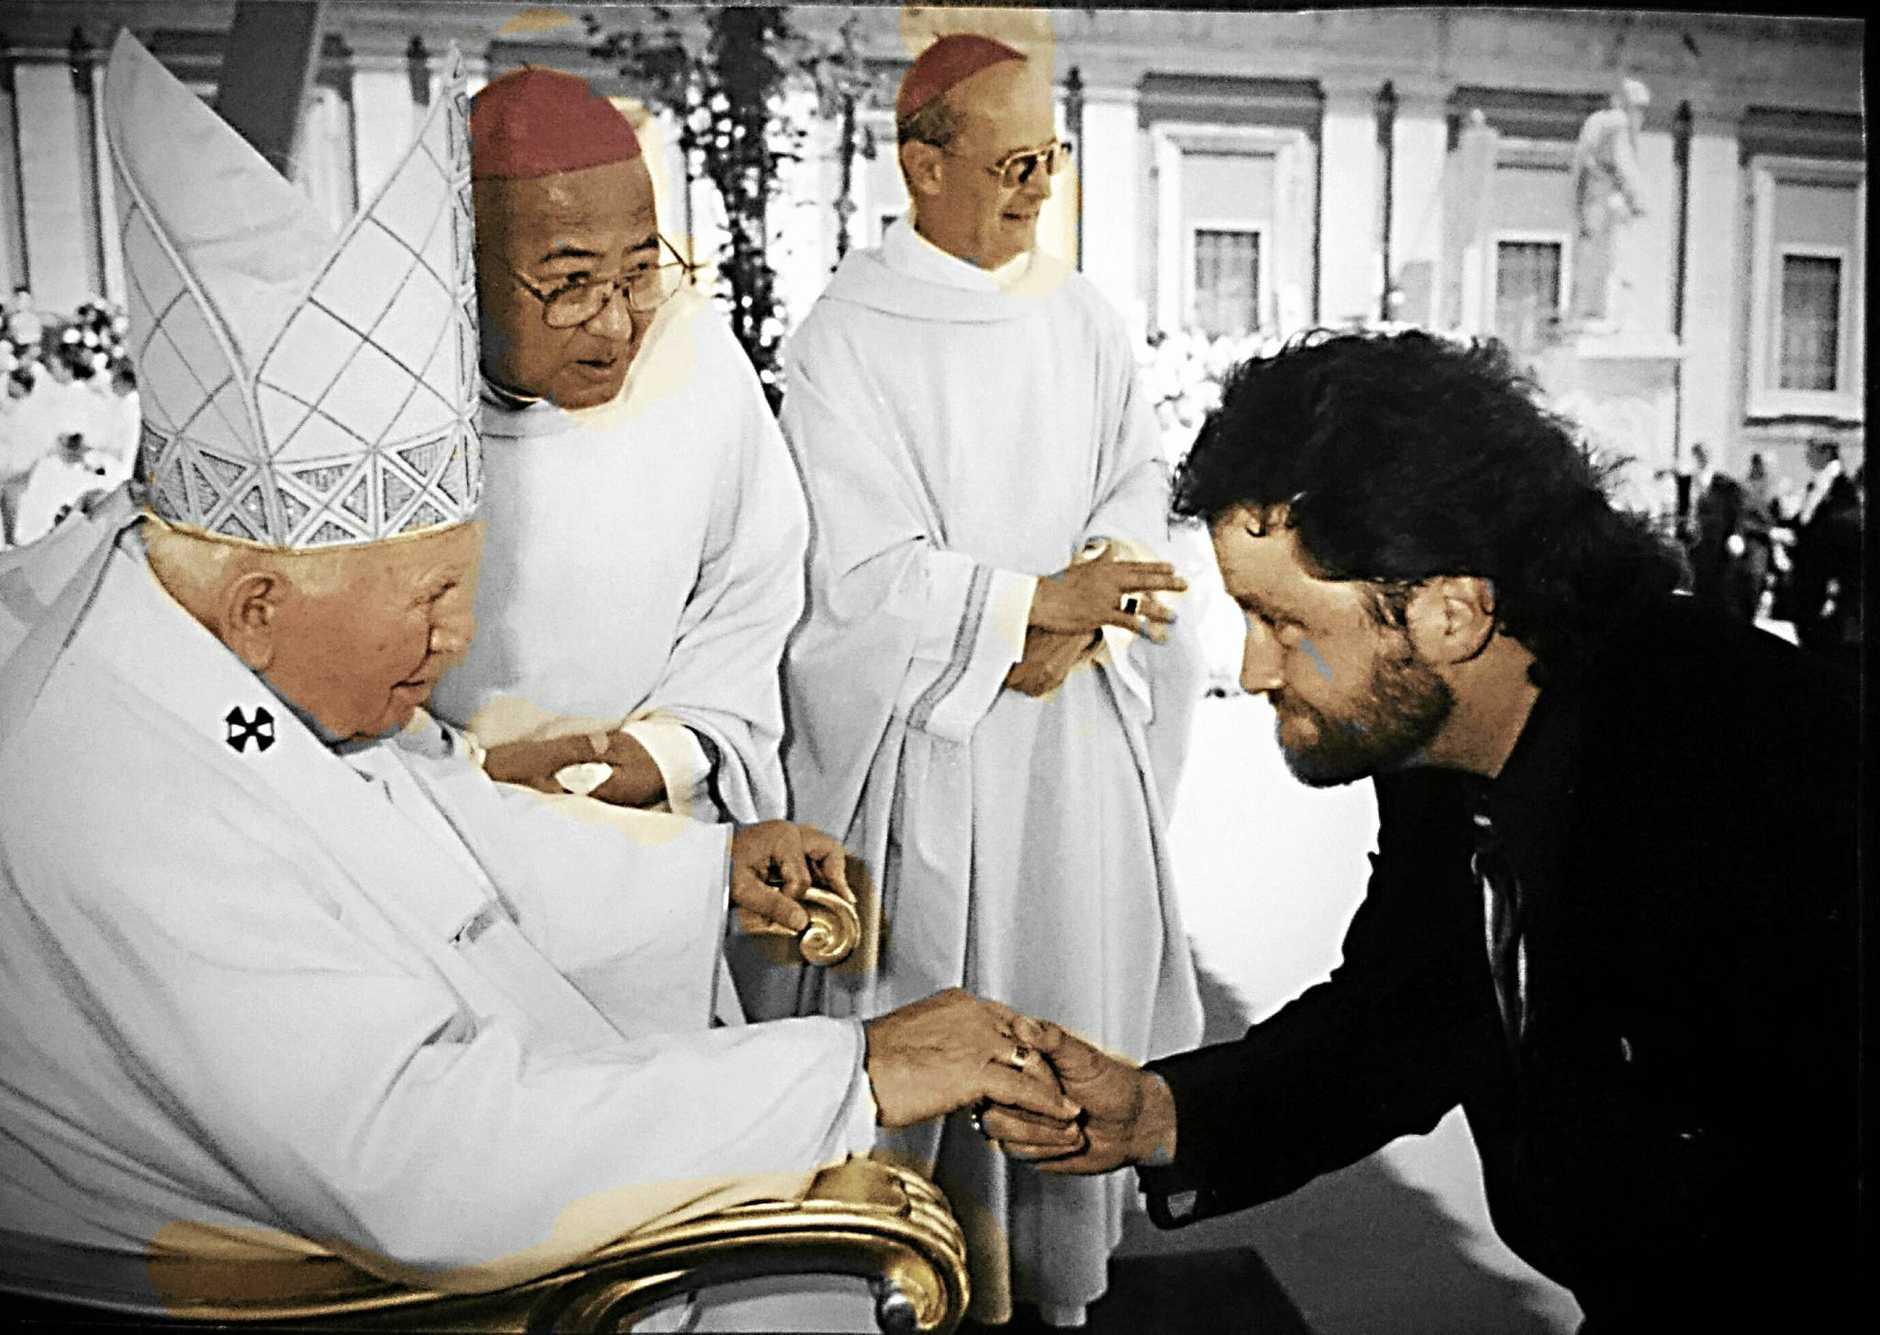 Douglas Webster in 'Les Mis' (above) and meeting Pope John Paul II